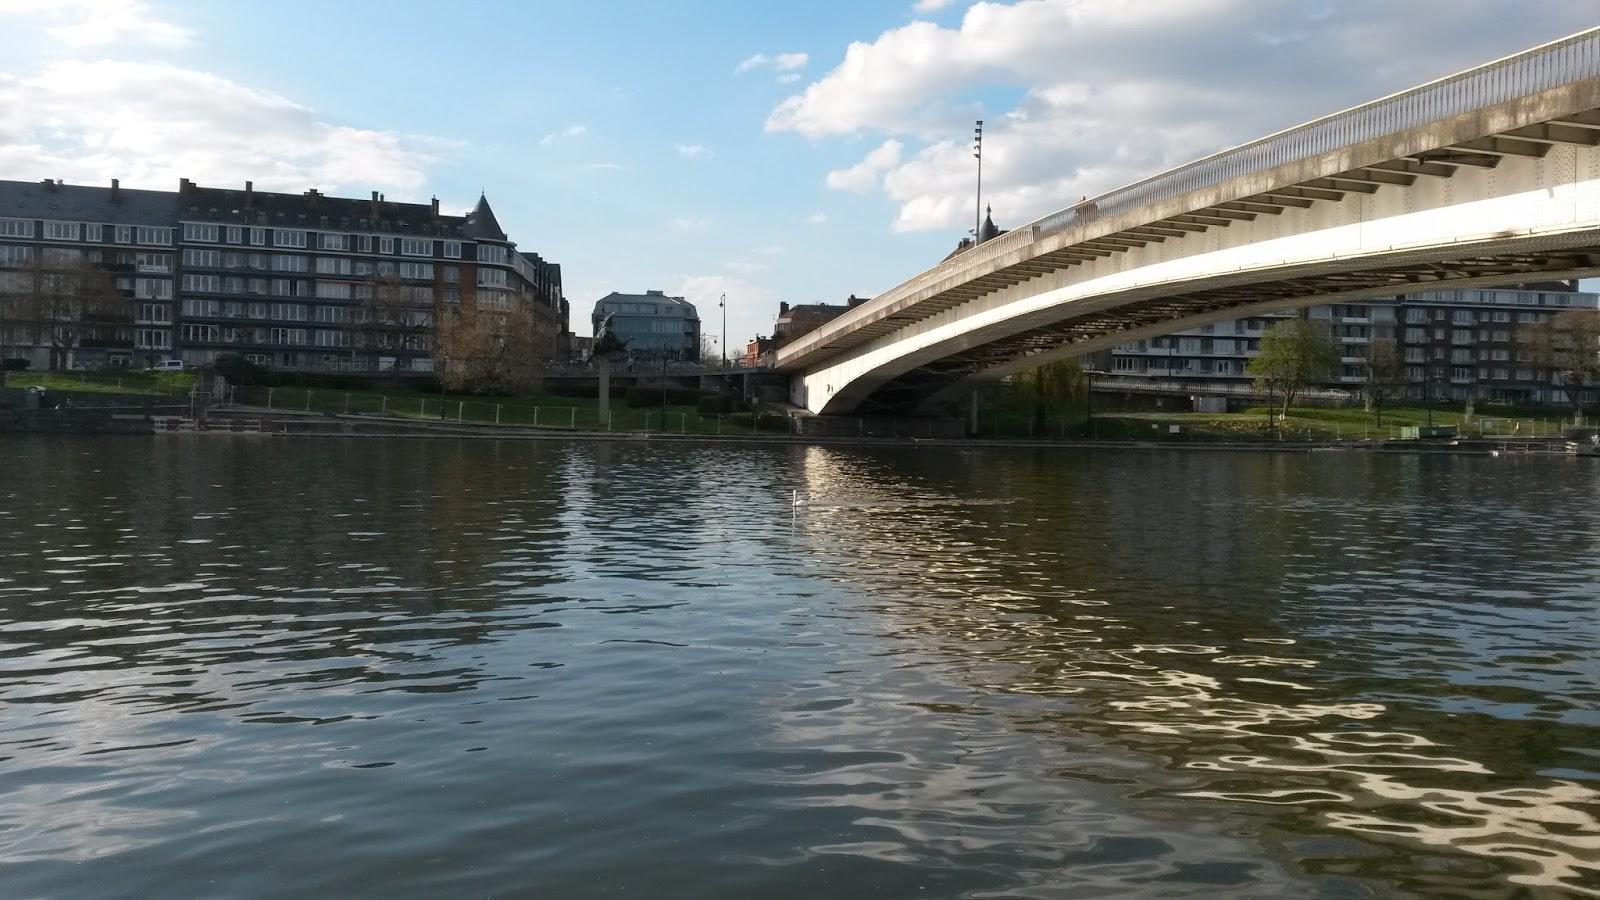 RAVeL 1 Centre (Part 5b) Tamines - Namur - Eurovelo 3 - Itinéraire n°6 - Page 4 2016-04-10%2B18.34.59